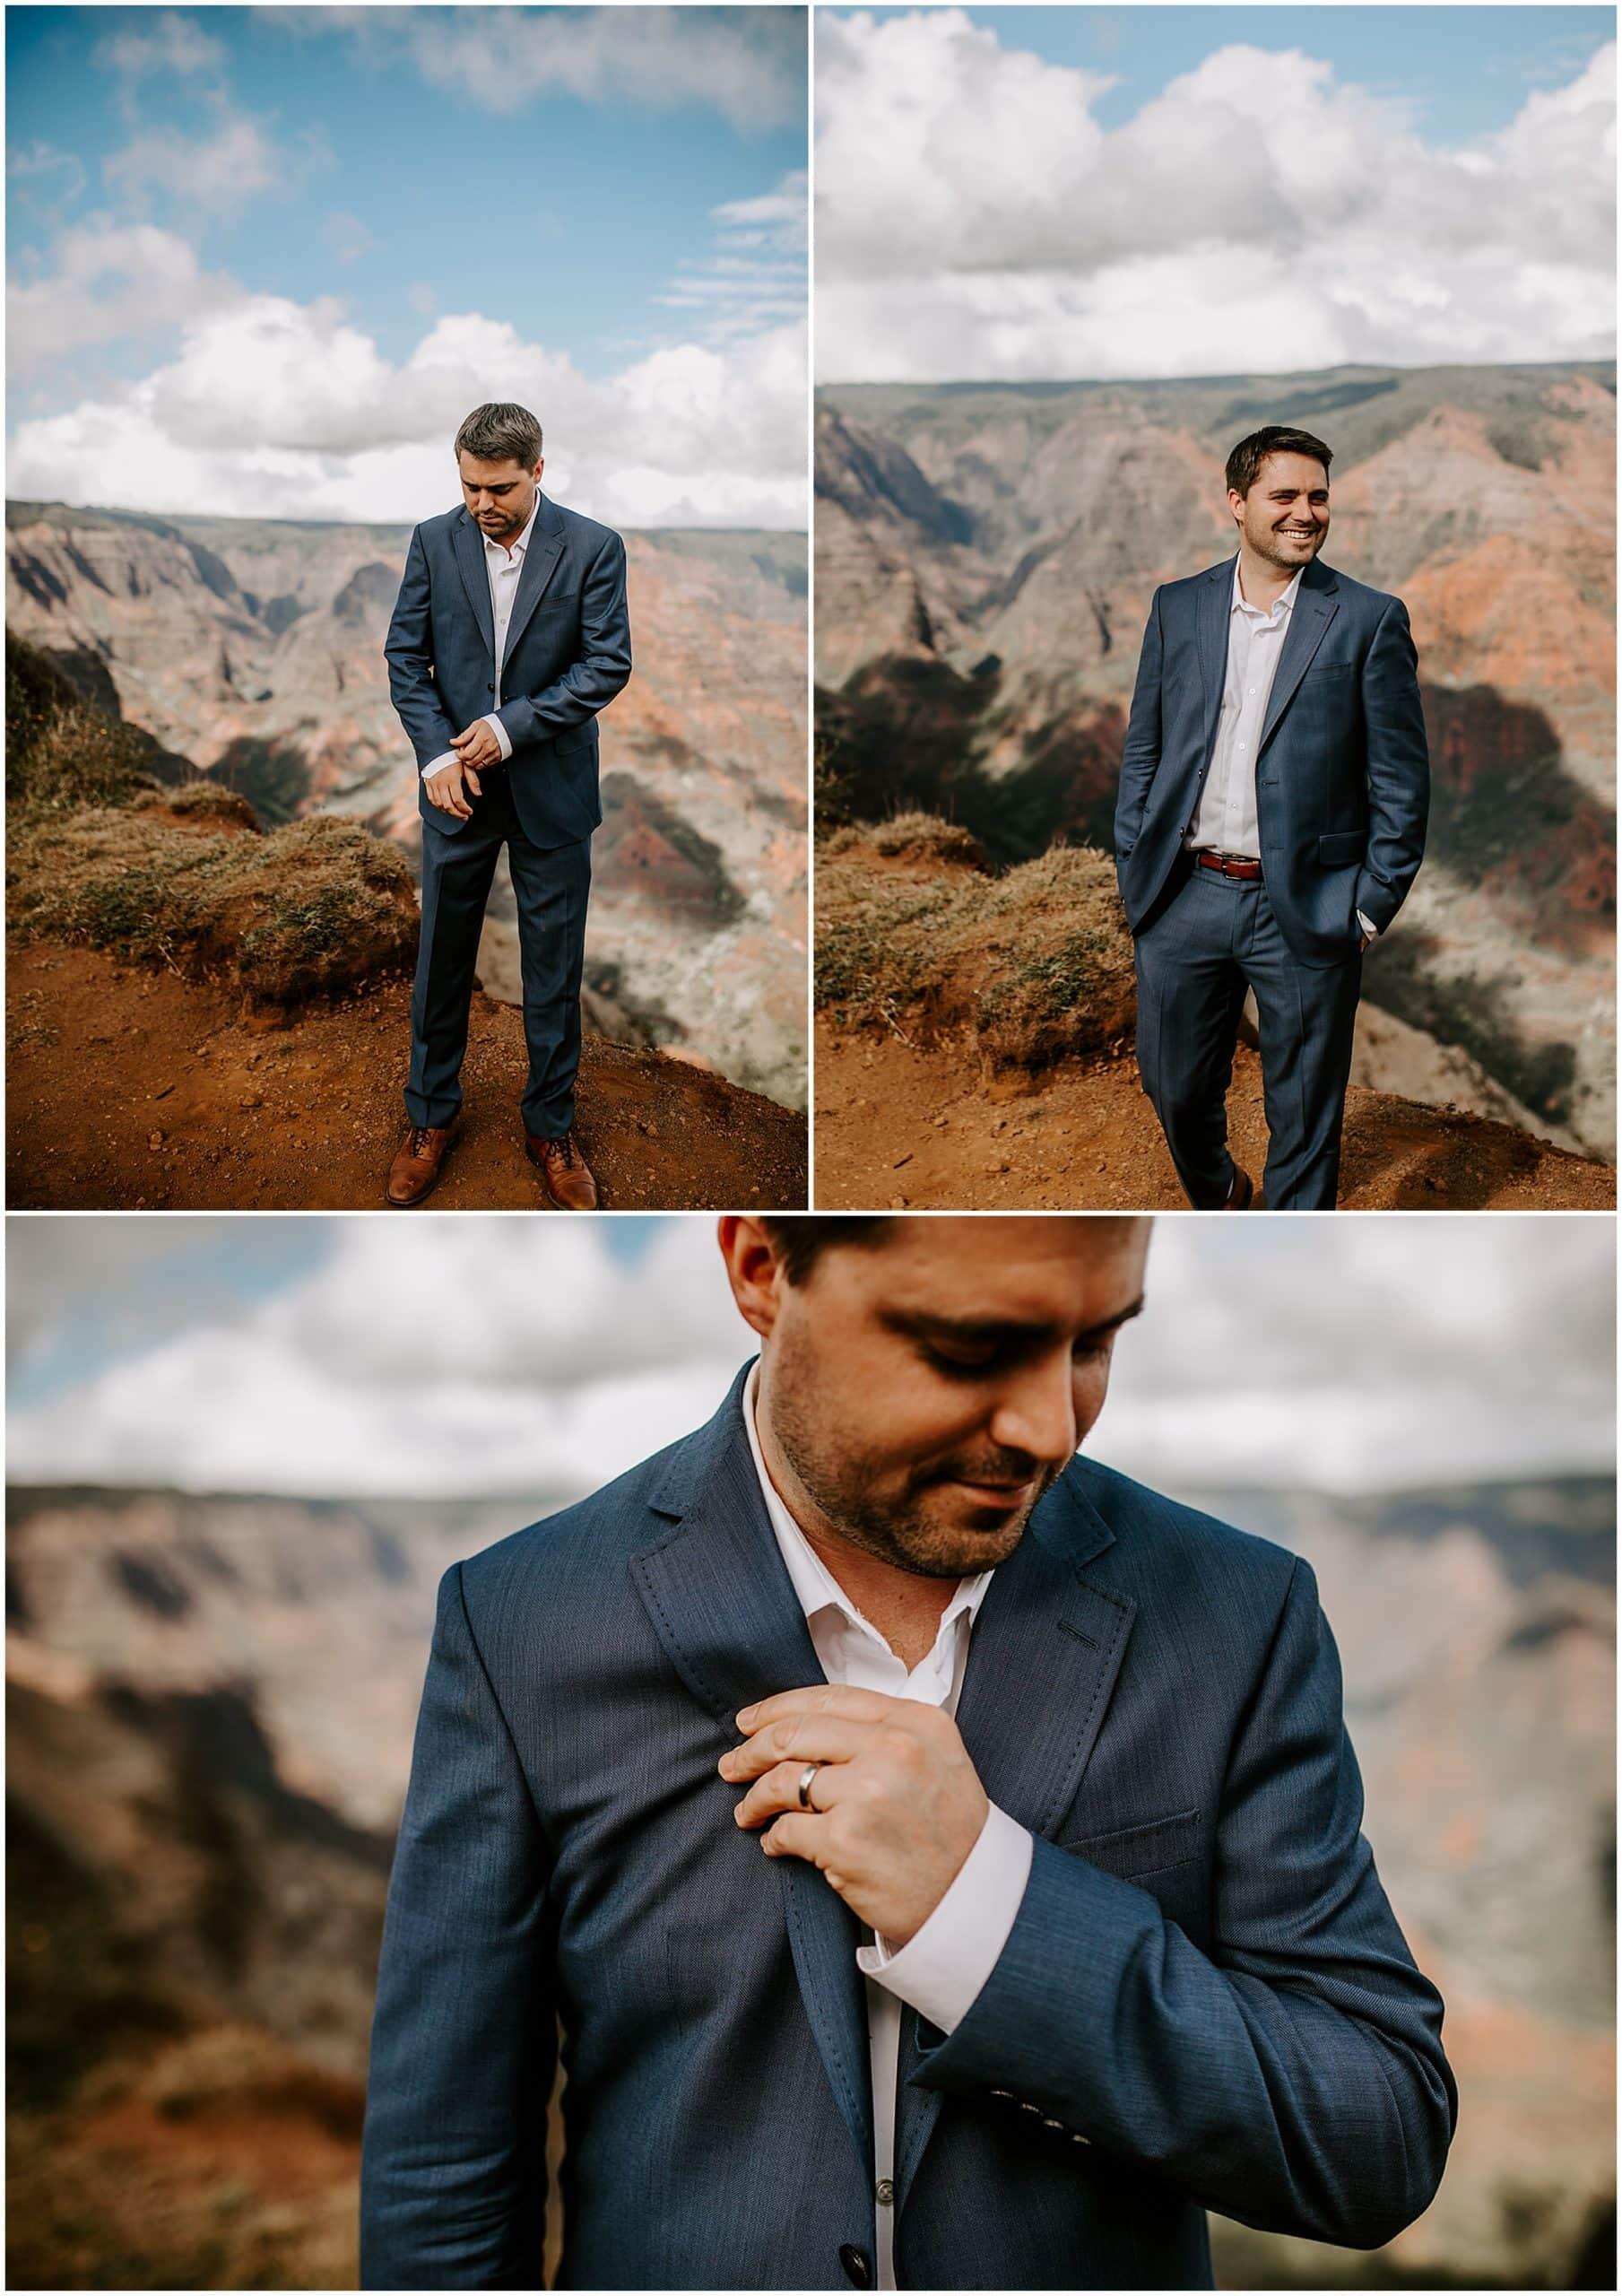 groom wearing navy suit